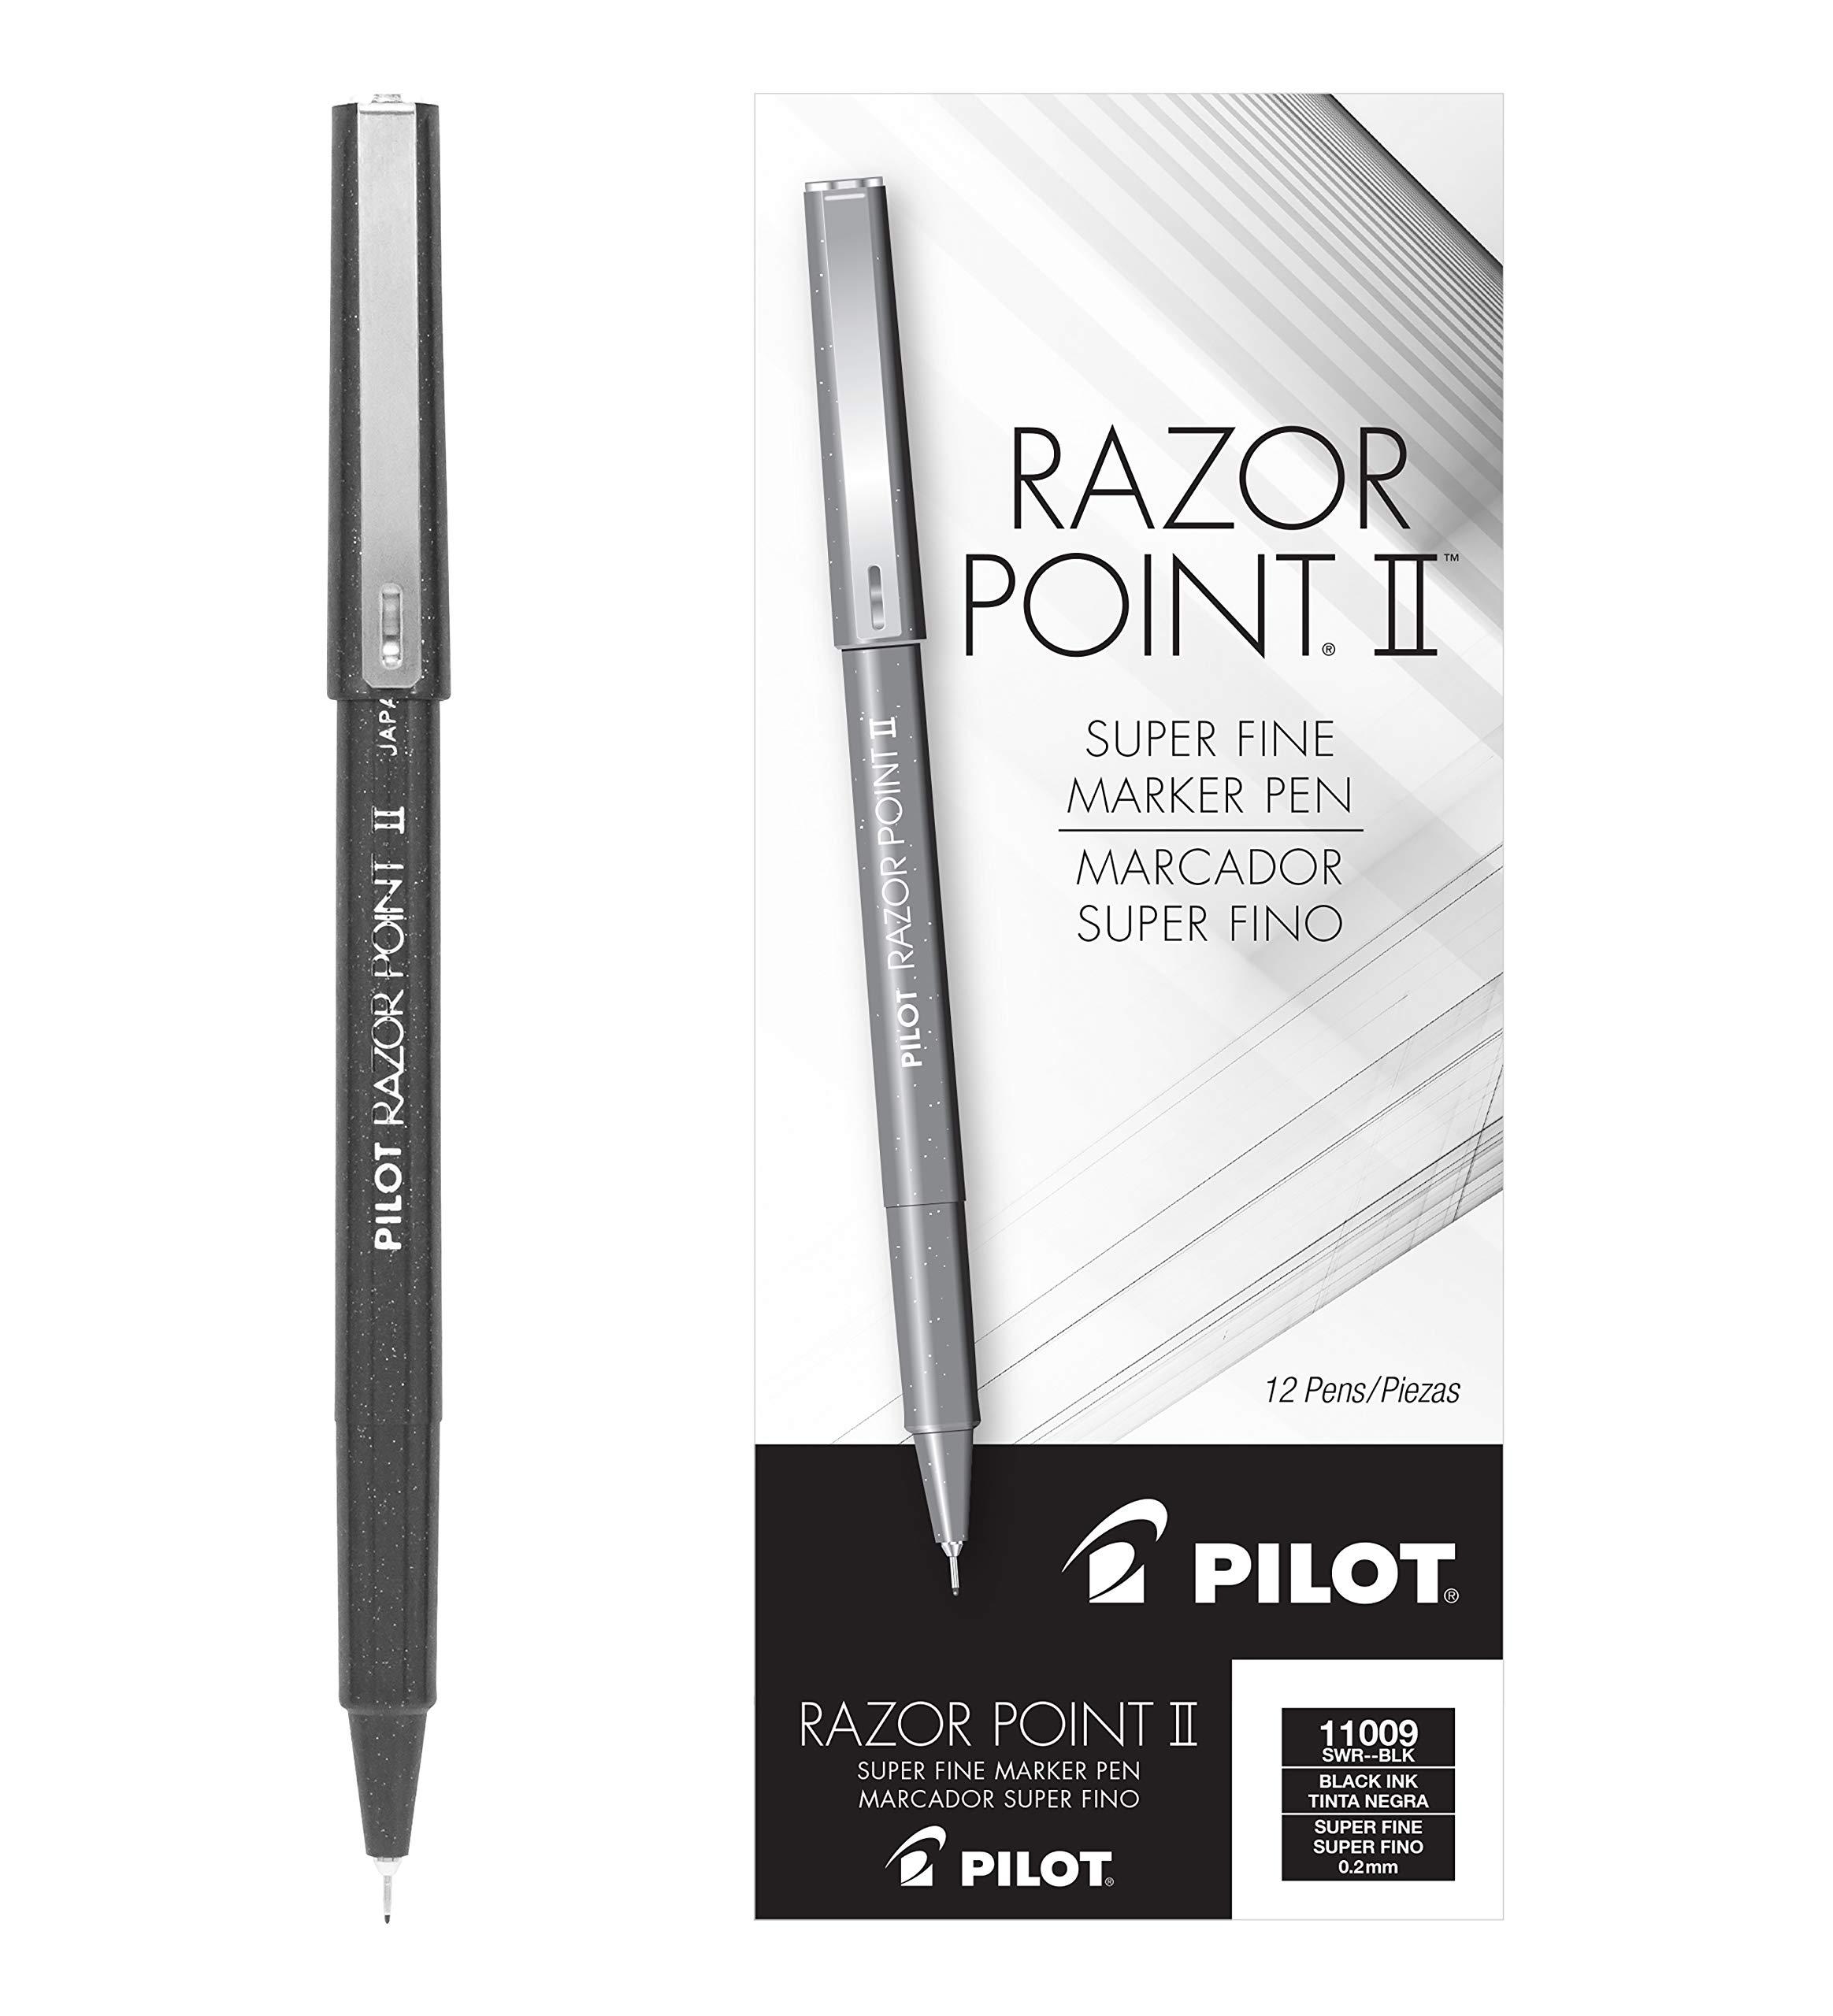 PILOT Razor Point II Fine Line Marker Stick Pens, Super Fine Point (0.2mm) Black Ink, 12 Count (11009)